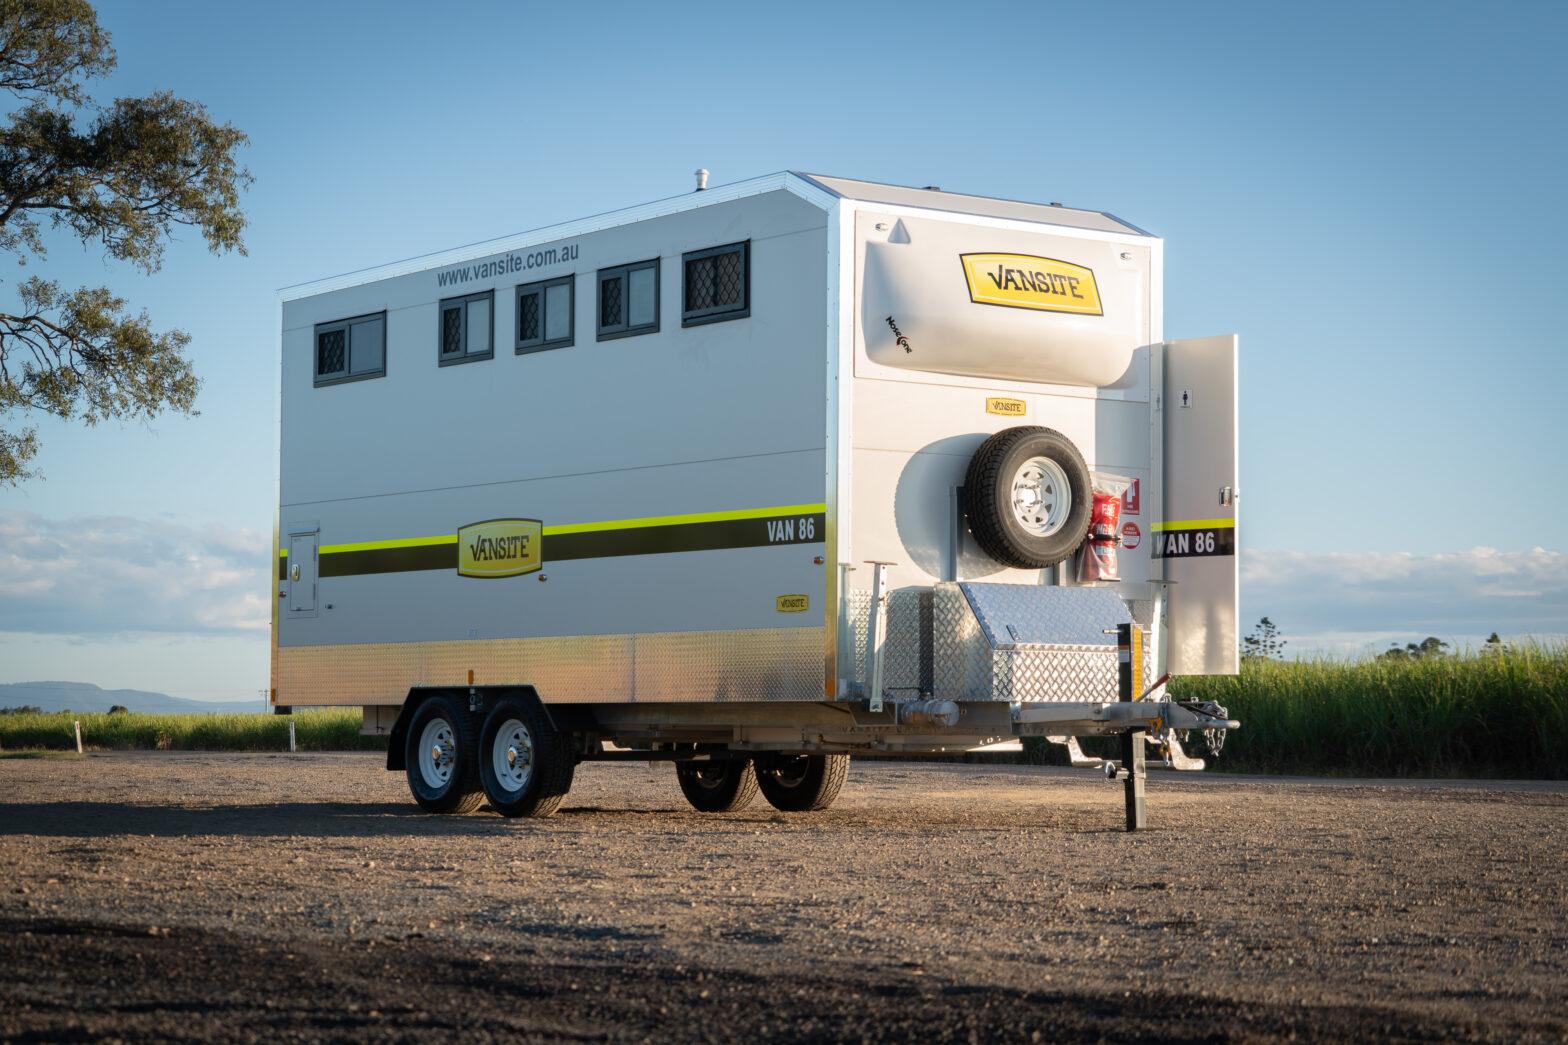 New Mobile Toilet Van!